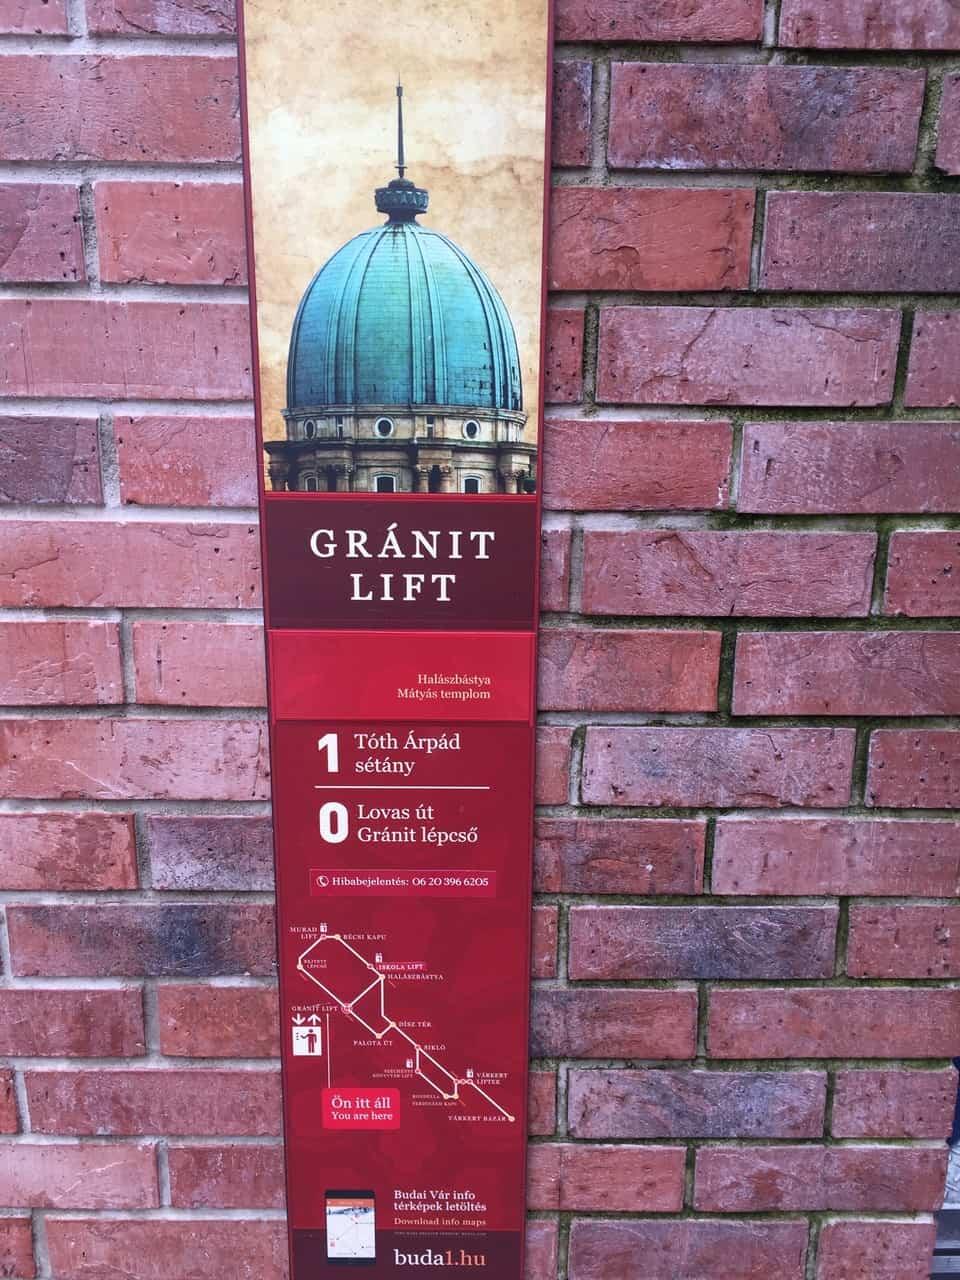 Budapest Lift